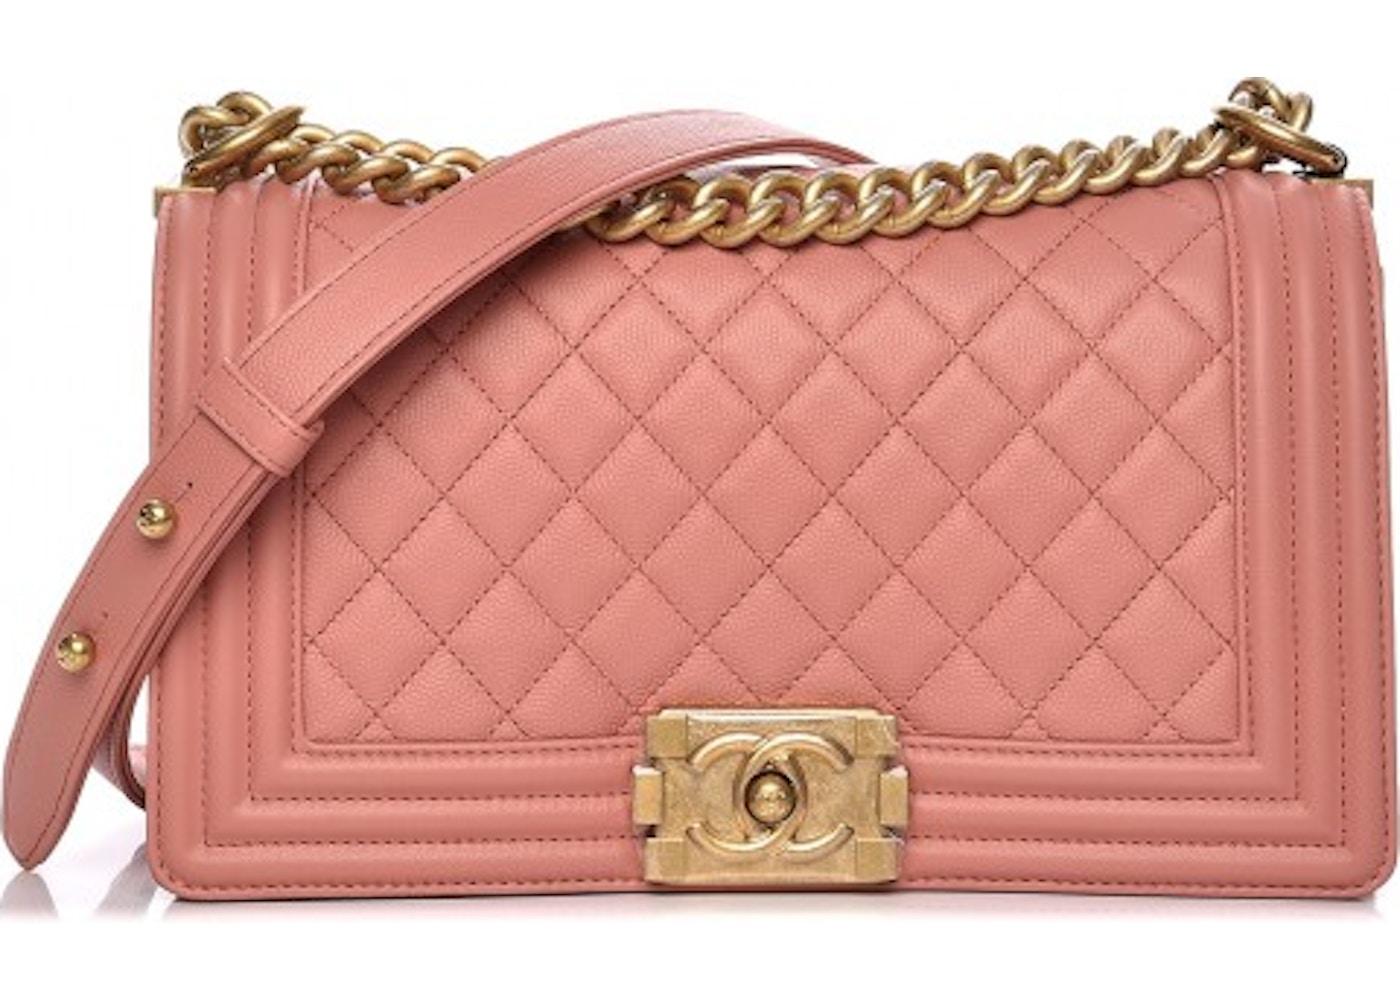 65554874464 Chanel Boy Flap Powder Quilted Diamond Medium Powder Pink